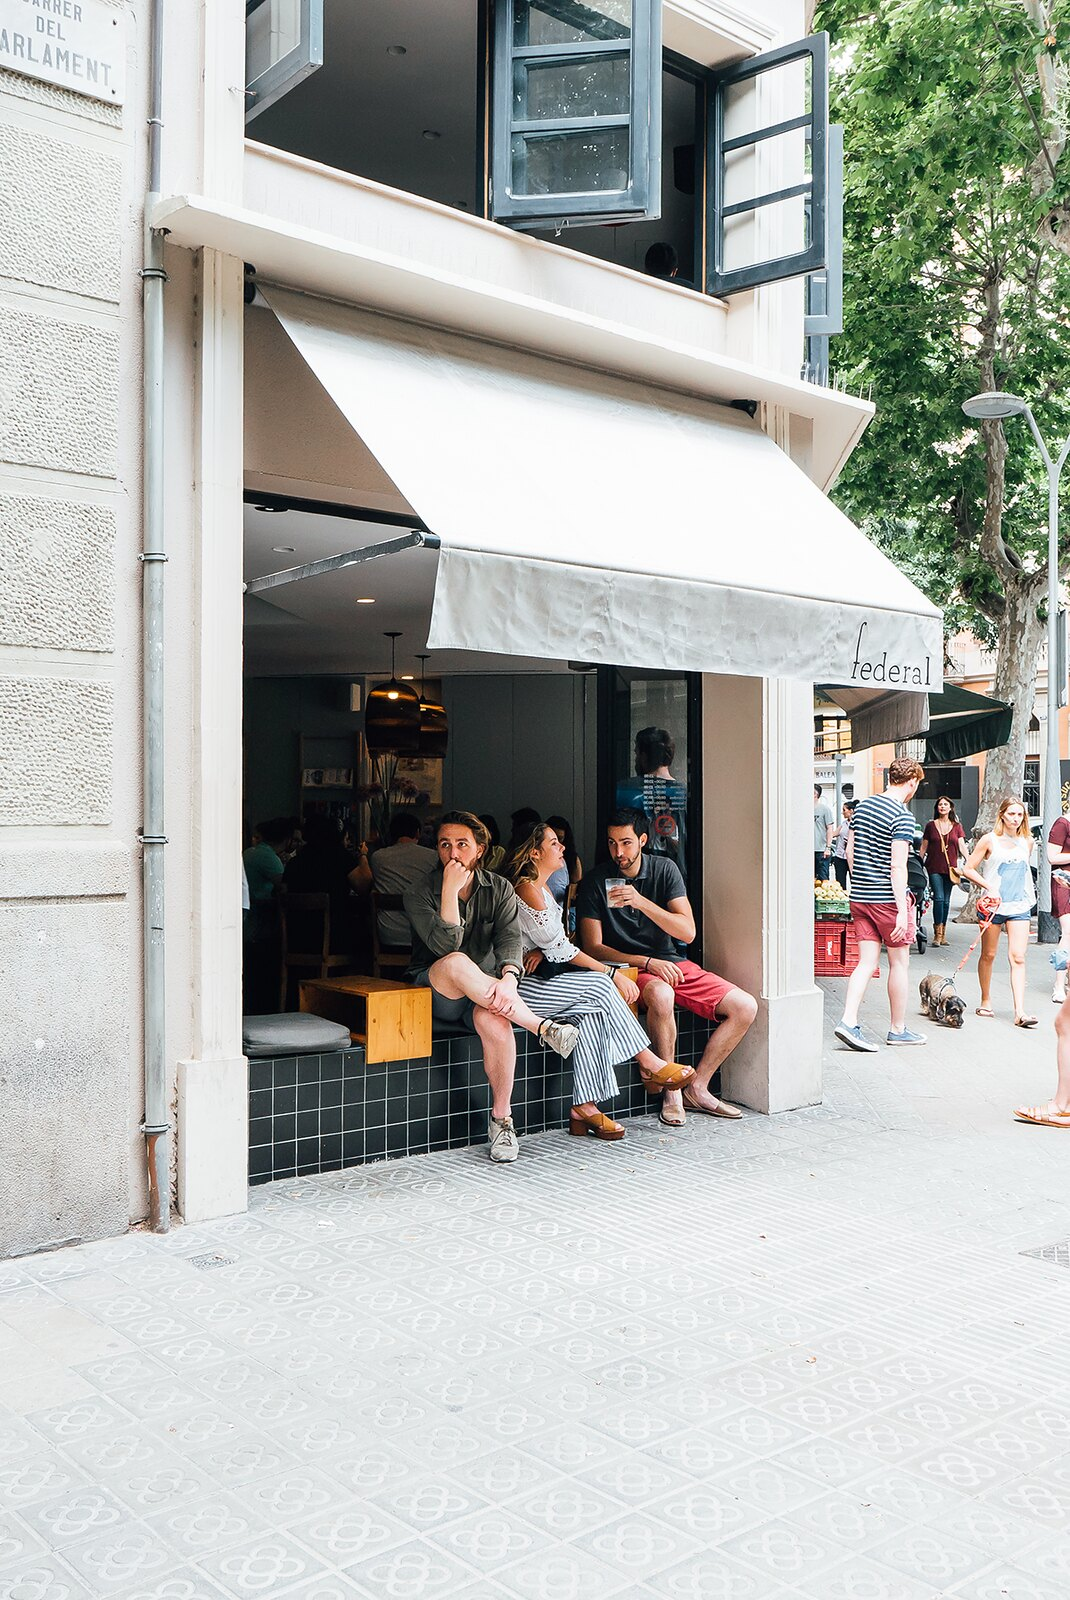 barcelona-federal-weareloveaddicts-120